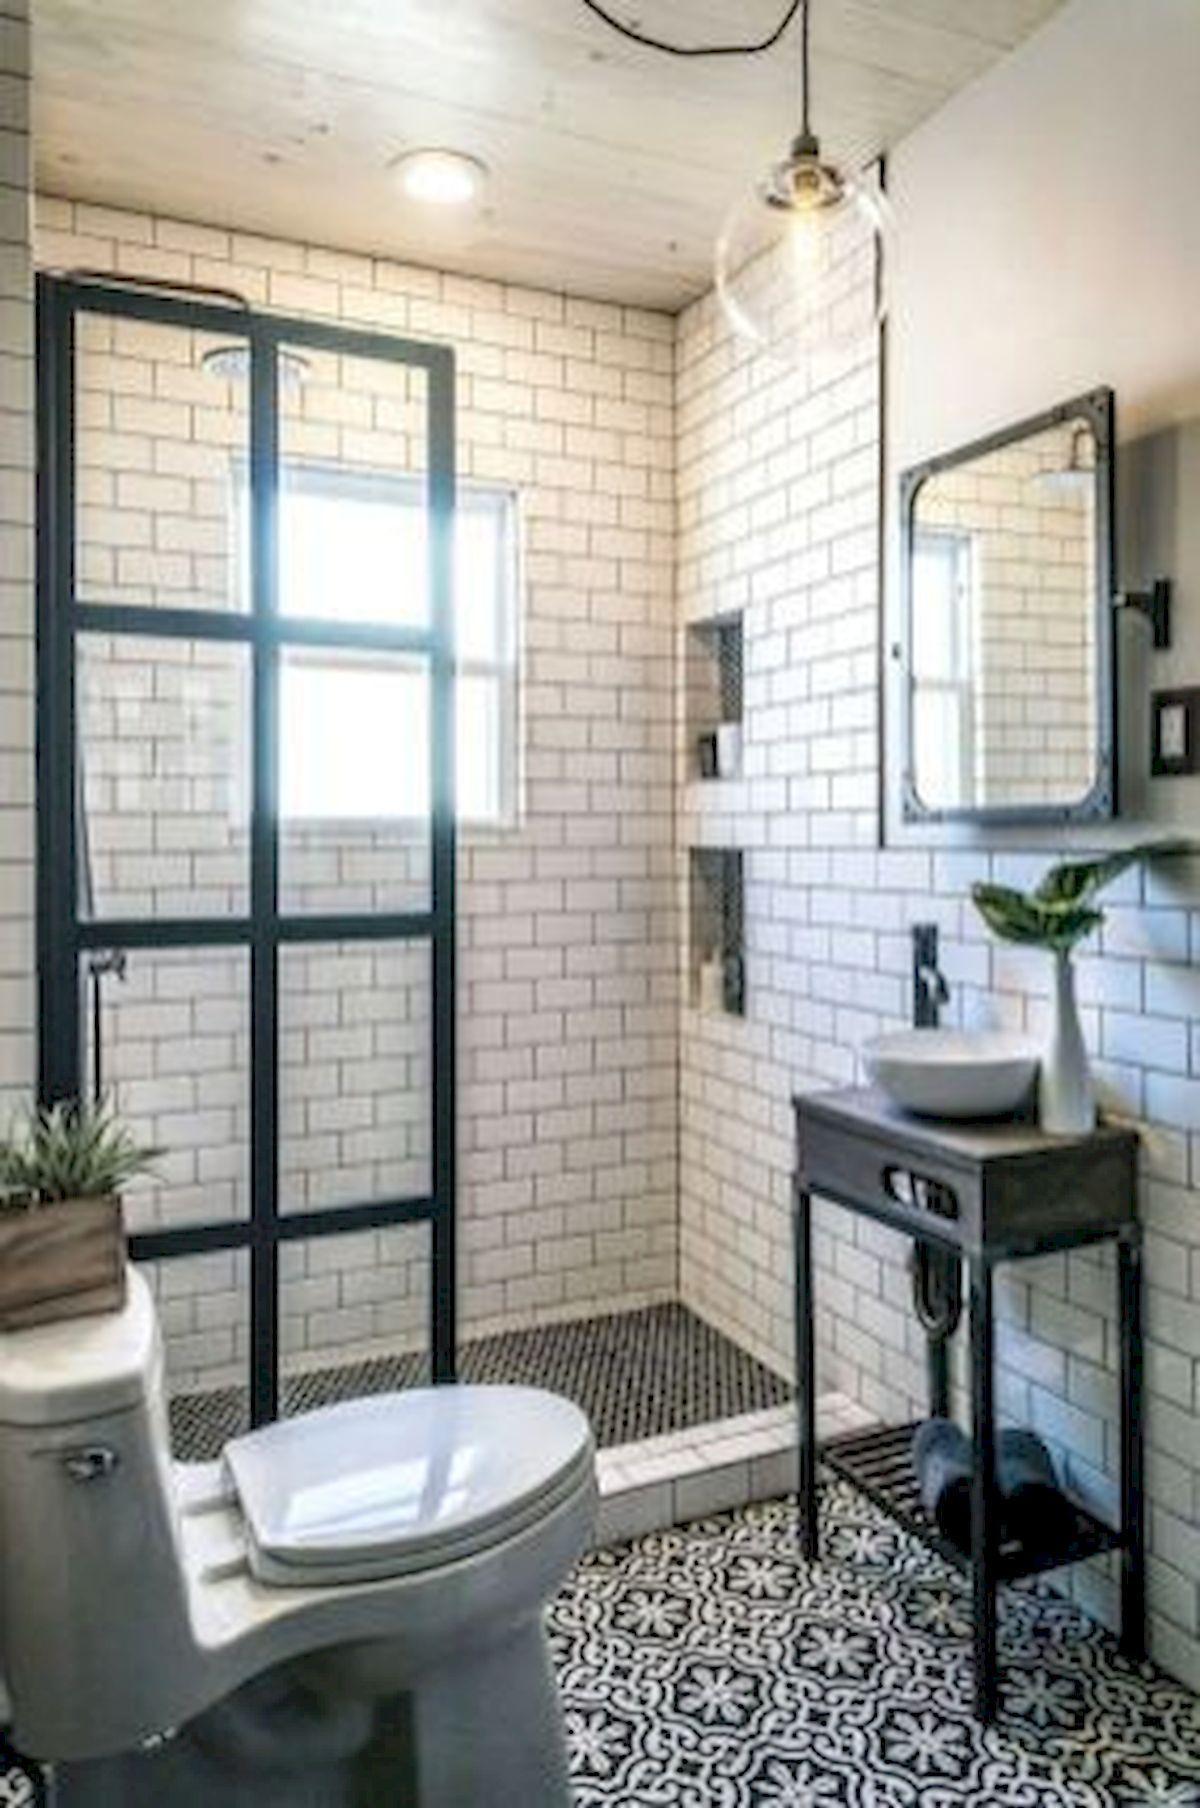 70 Suprising Small Bathroom Design Ideas And Decor 17 Worldecor Co Bathroom Design Small Small Bathroom Remodel Tiny House Bathroom